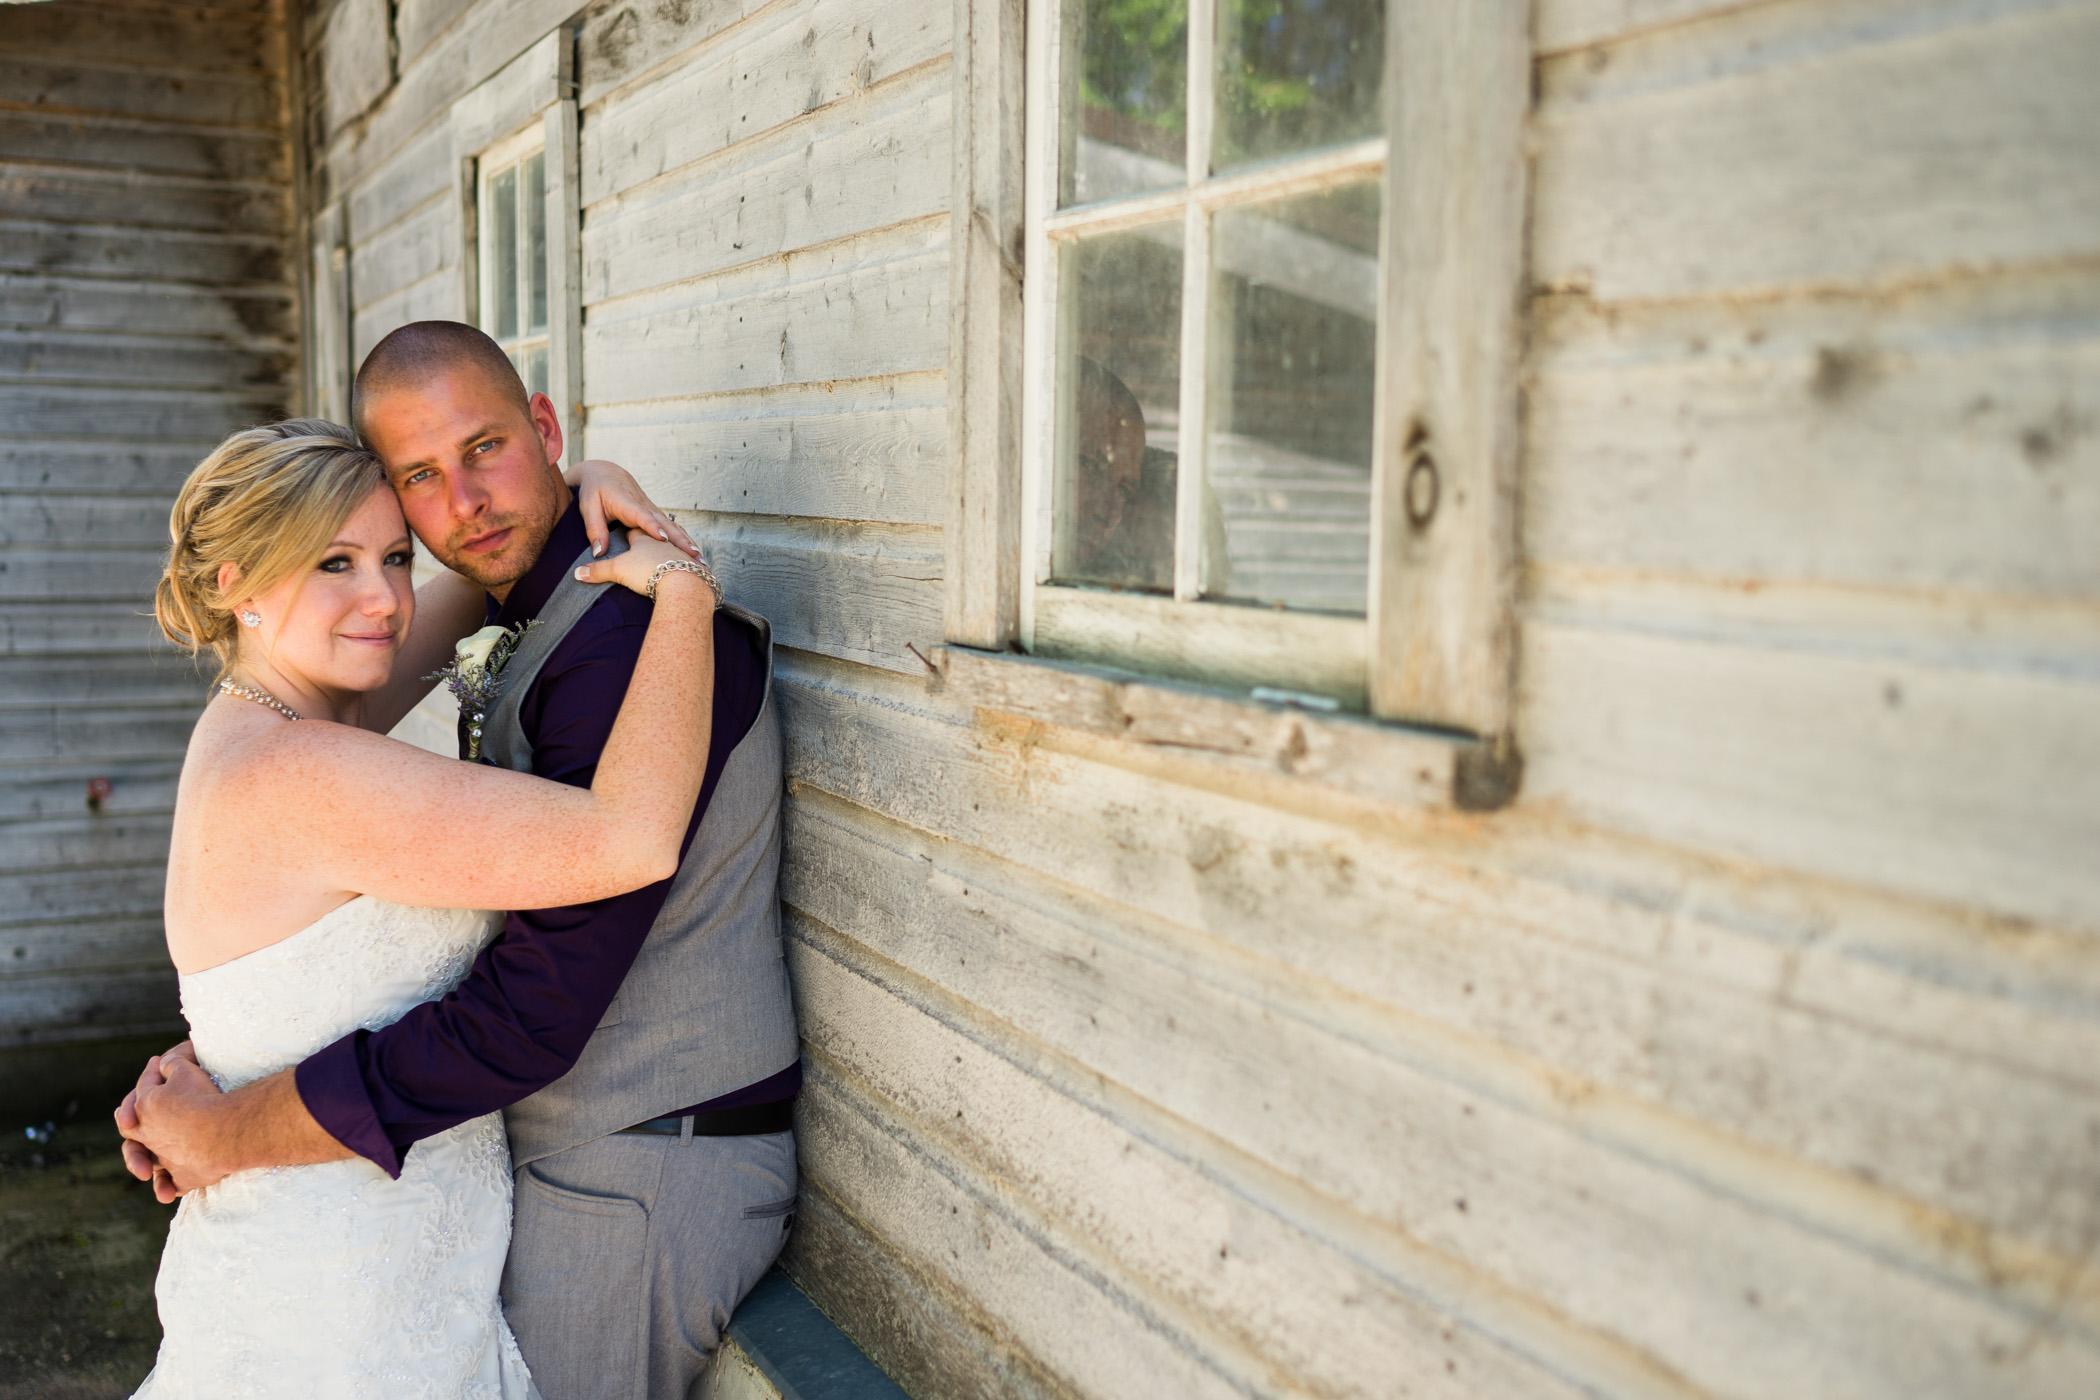 COJO Photo - Whitney and Steve - Wedding-912.jpg